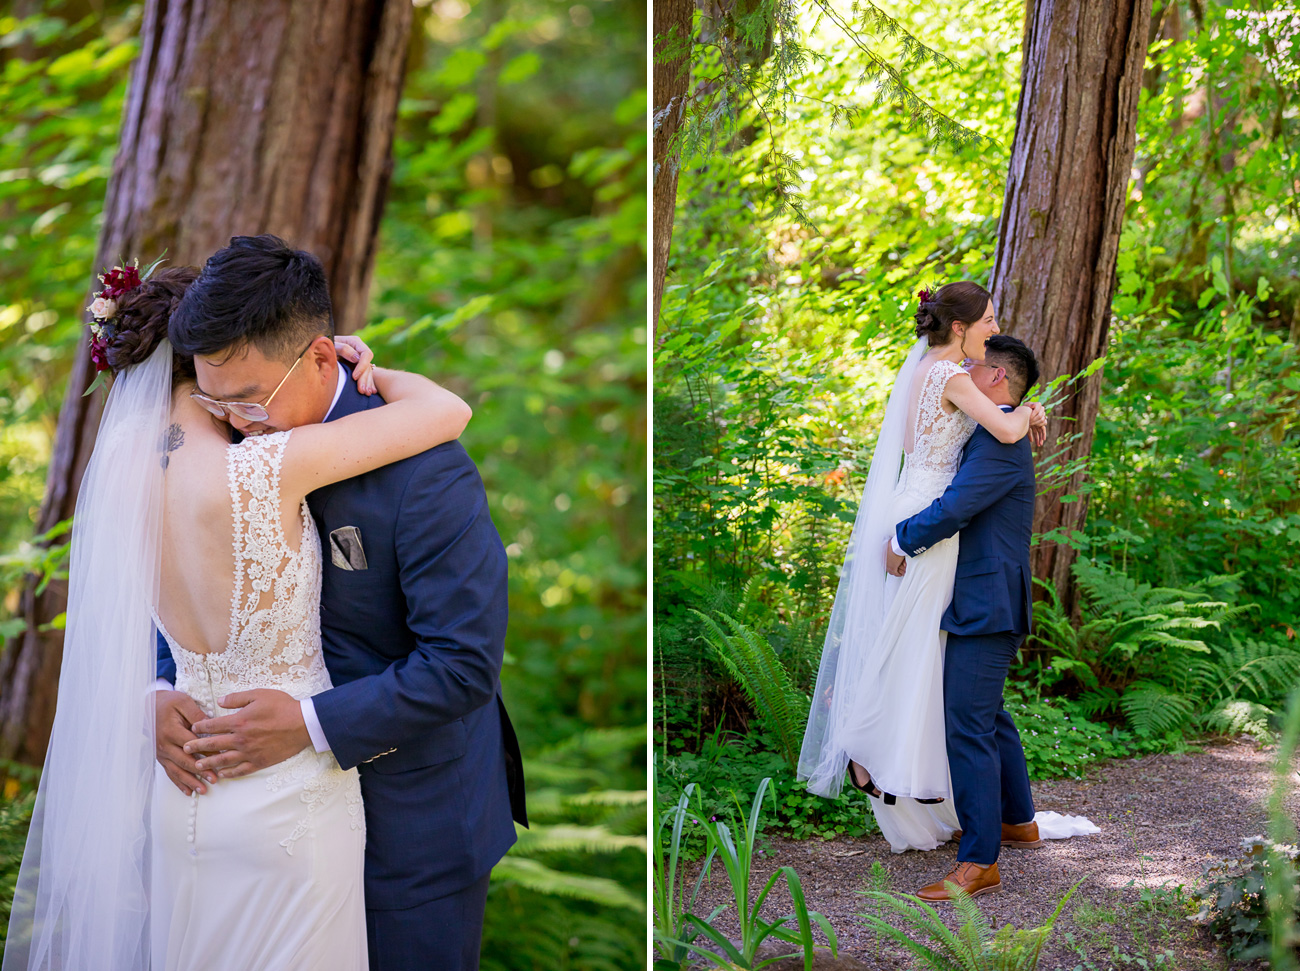 loloma-lodge-oregon-wedding-65 Loloma Lodge Oregon Wedding | Anna & Justin | Traditional Korean Tea Ceremony